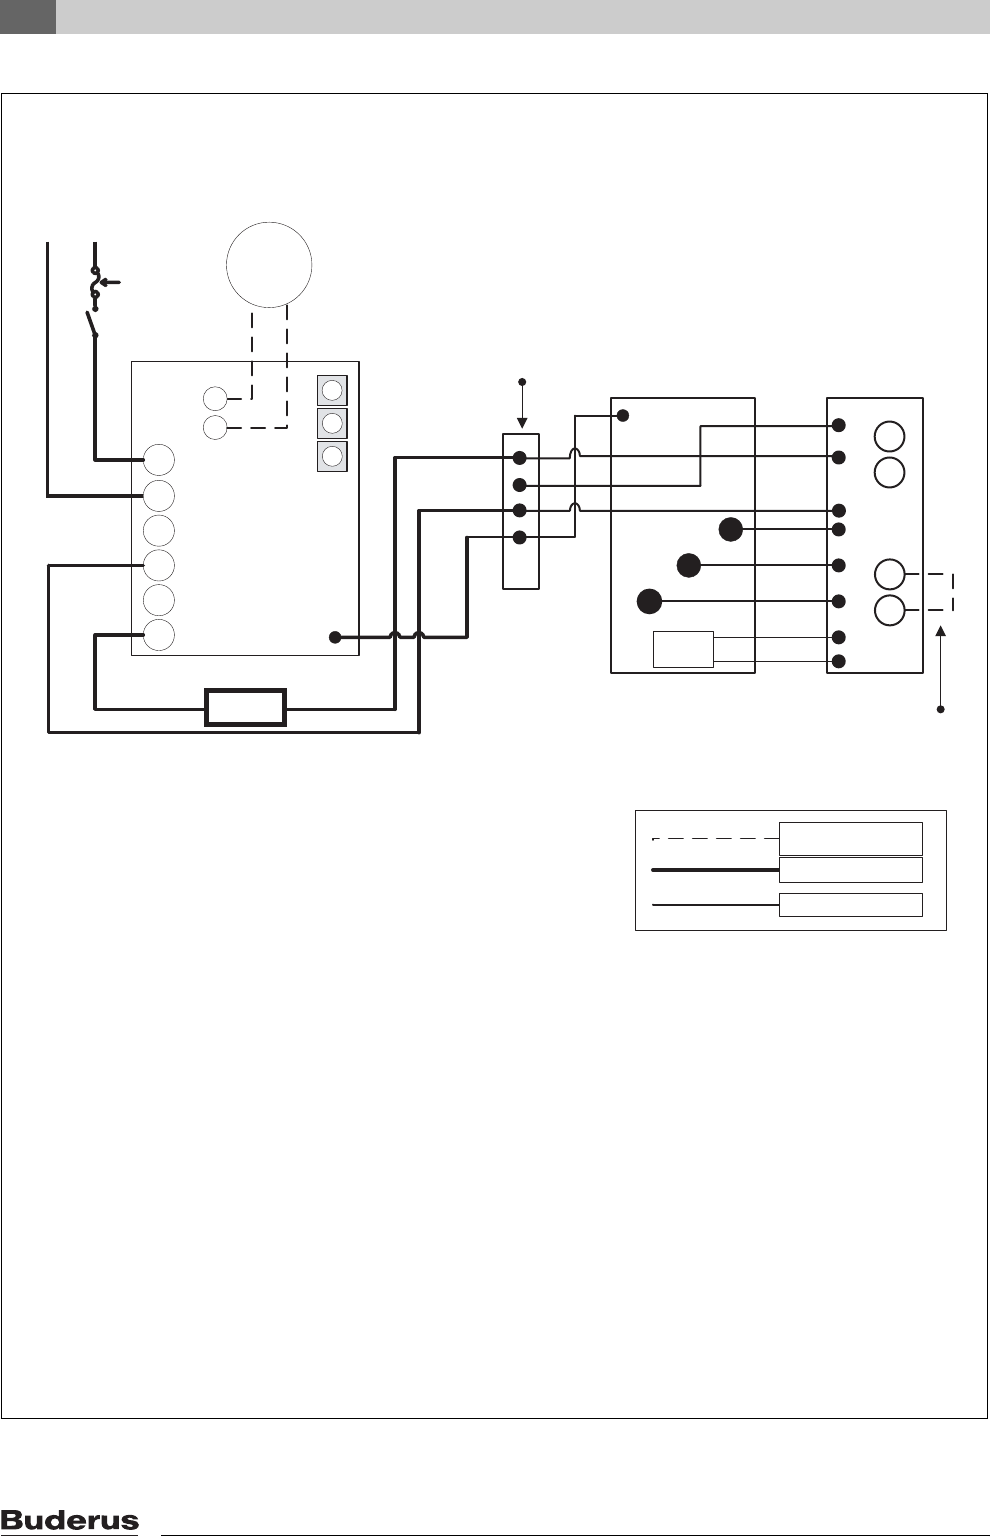 Astonishing Handleiding Buderus Logano G115 Ws Pagina 52 Van 60 English Wiring Digital Resources Honesemecshebarightsorg